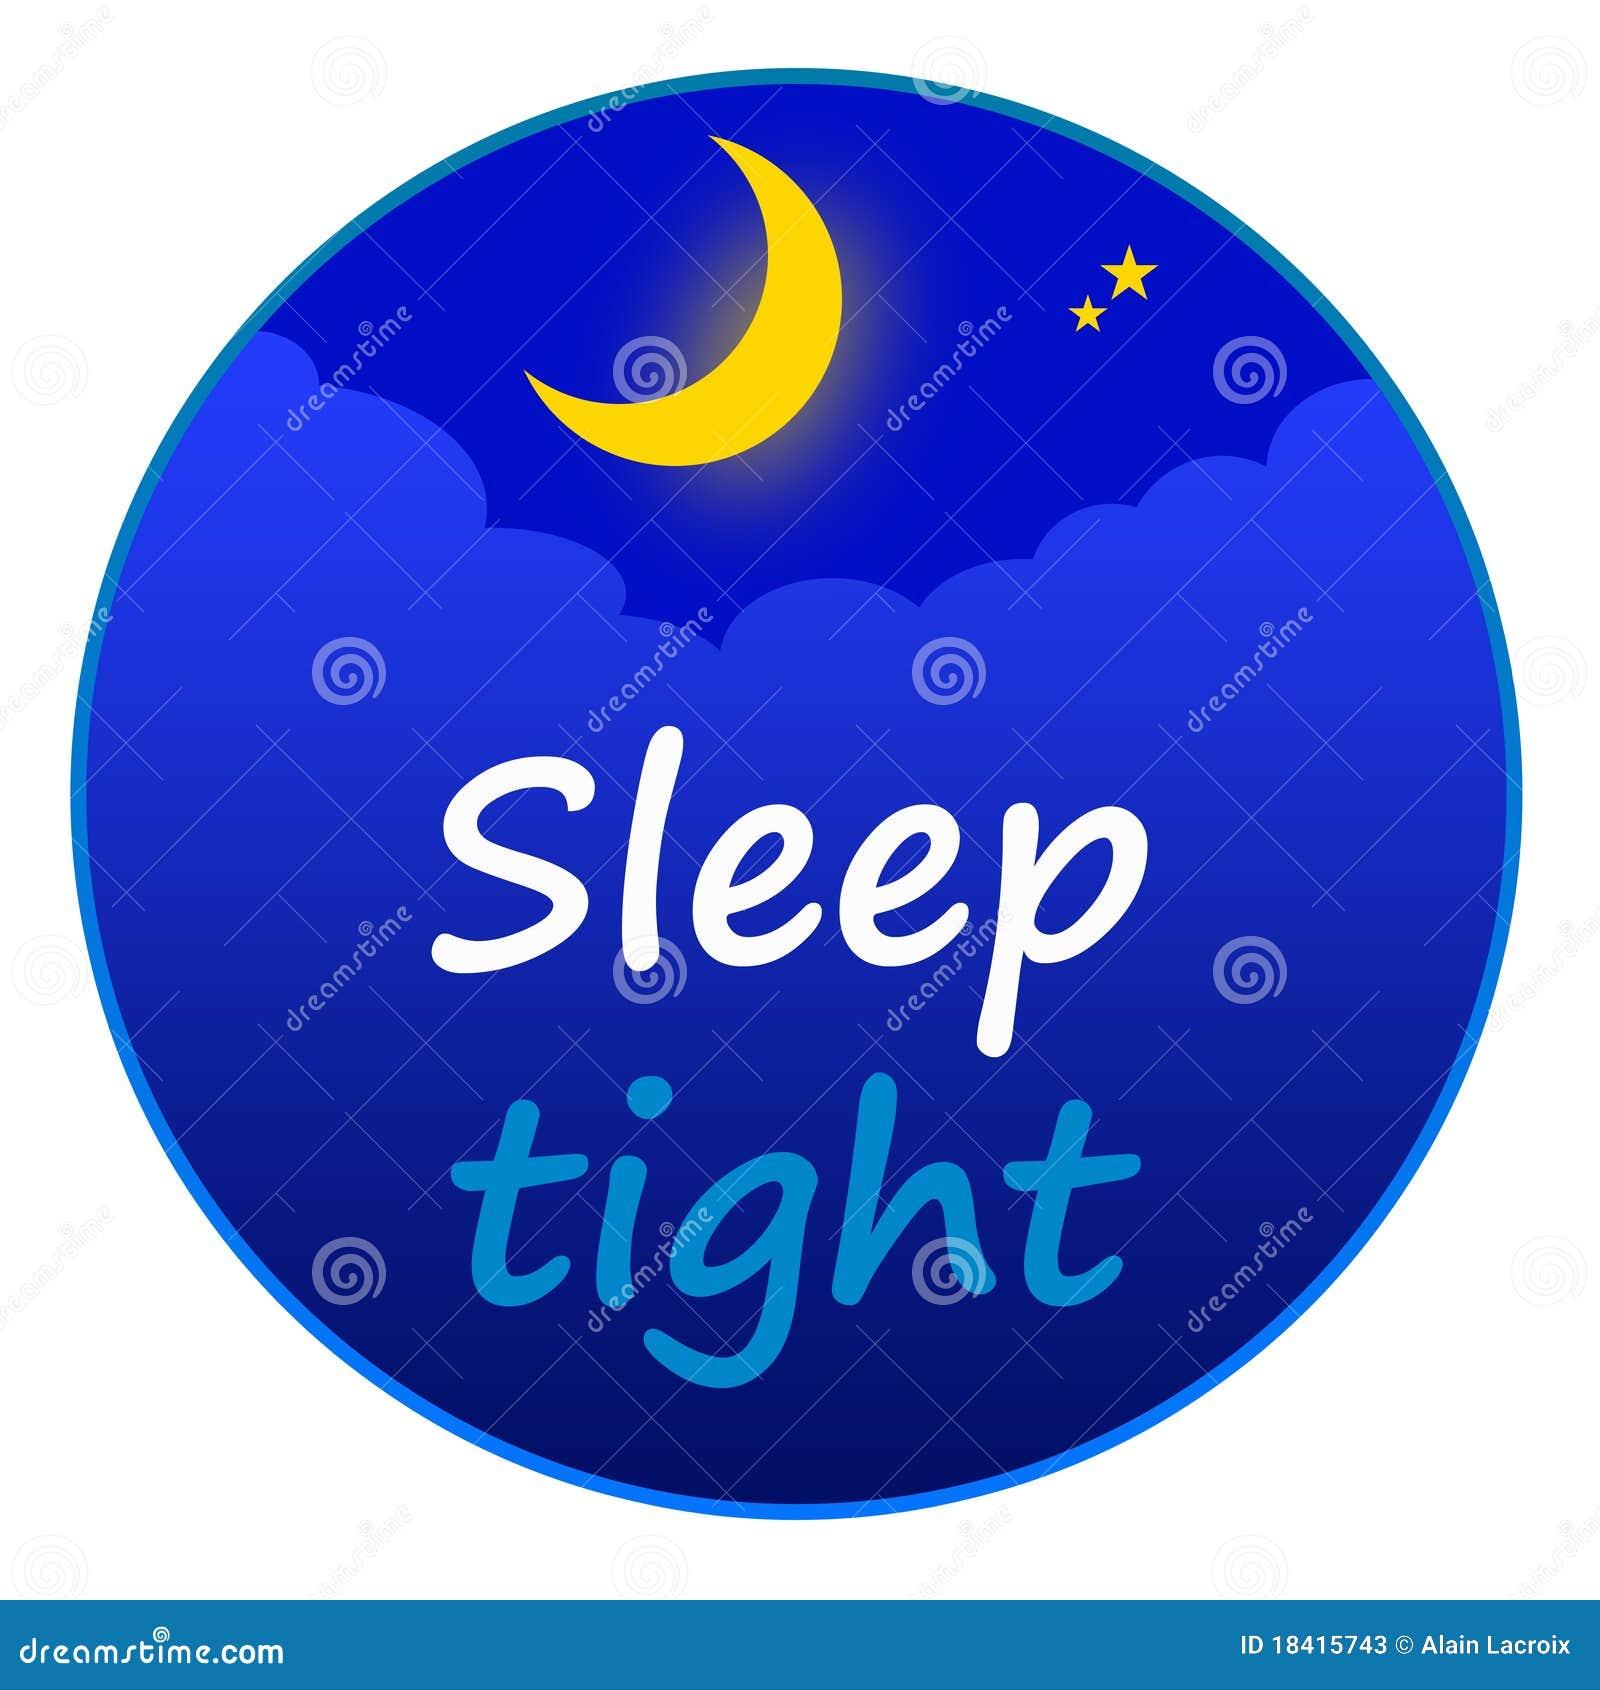 Sleep tight stock photos image 18415743